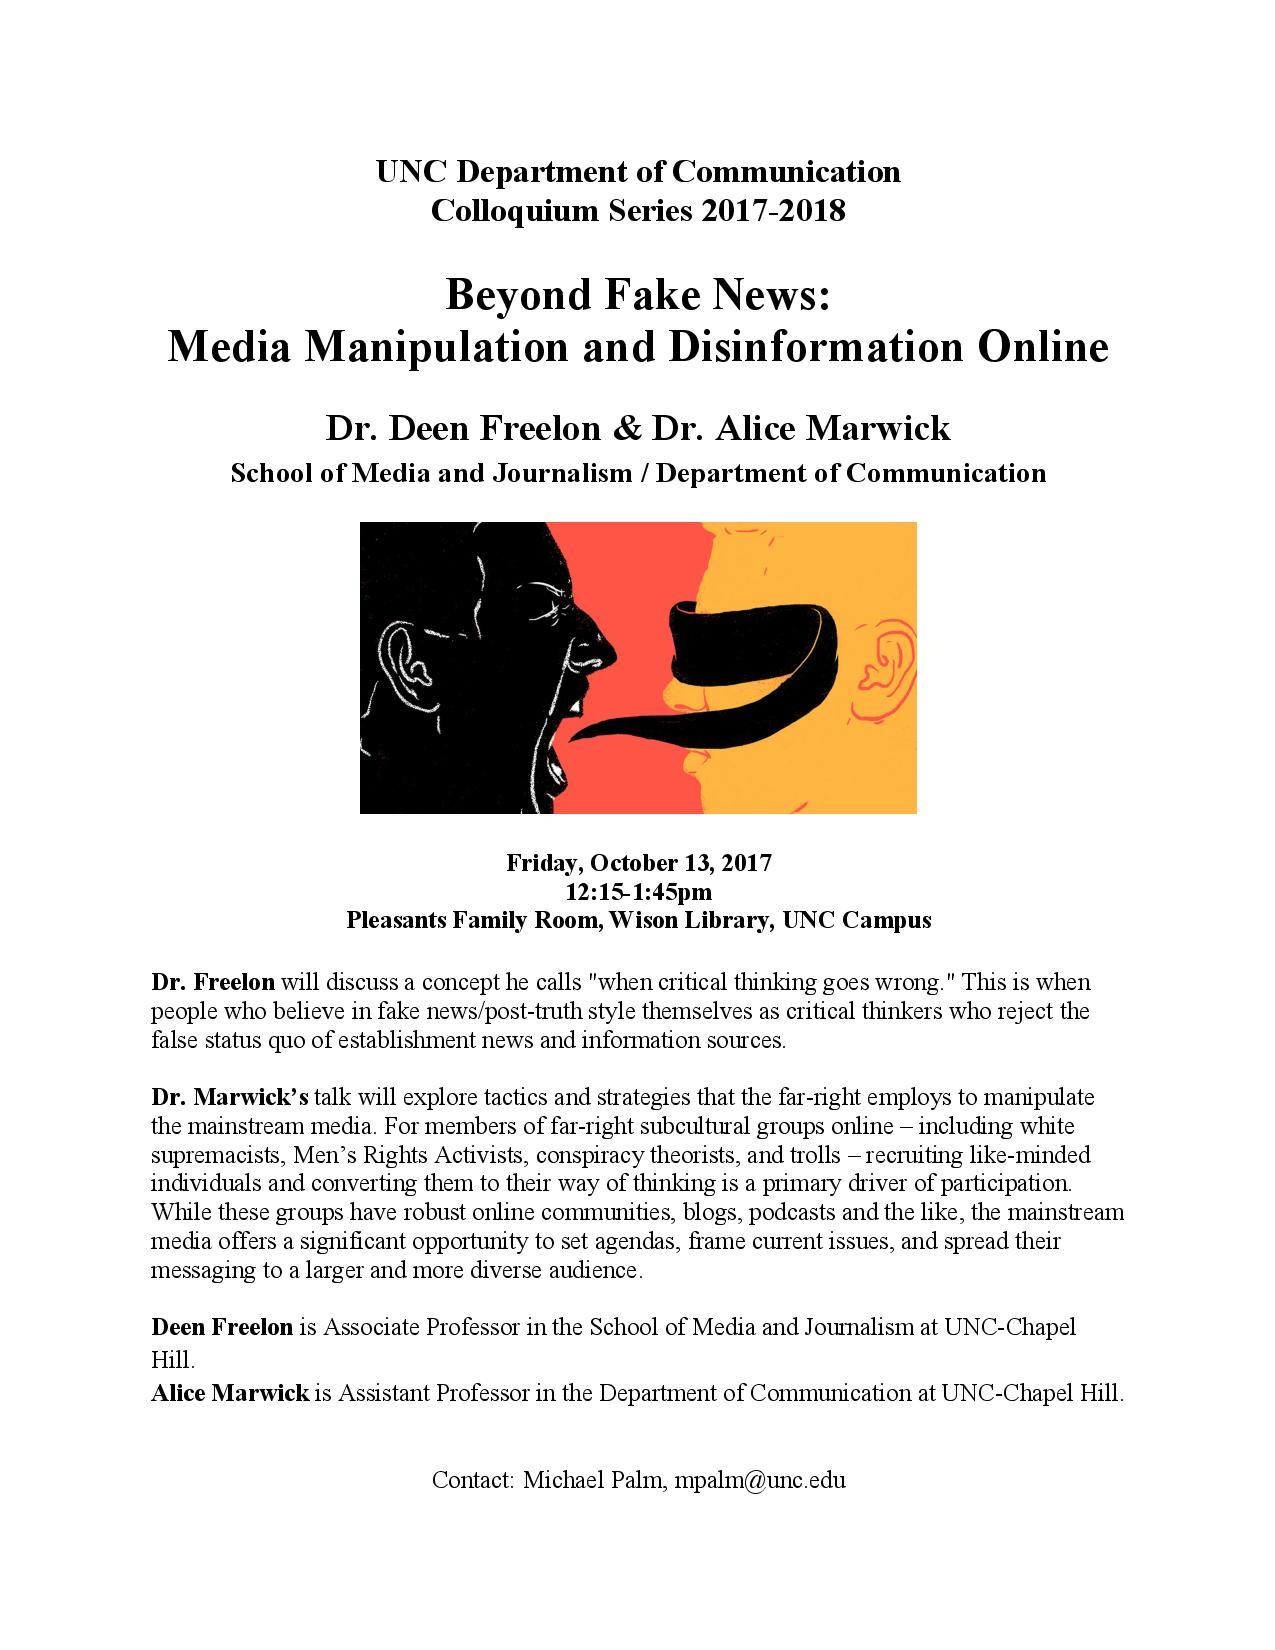 COMM Colloquium Series: Dr  Alice Marwick & Dr  Deen Freelon